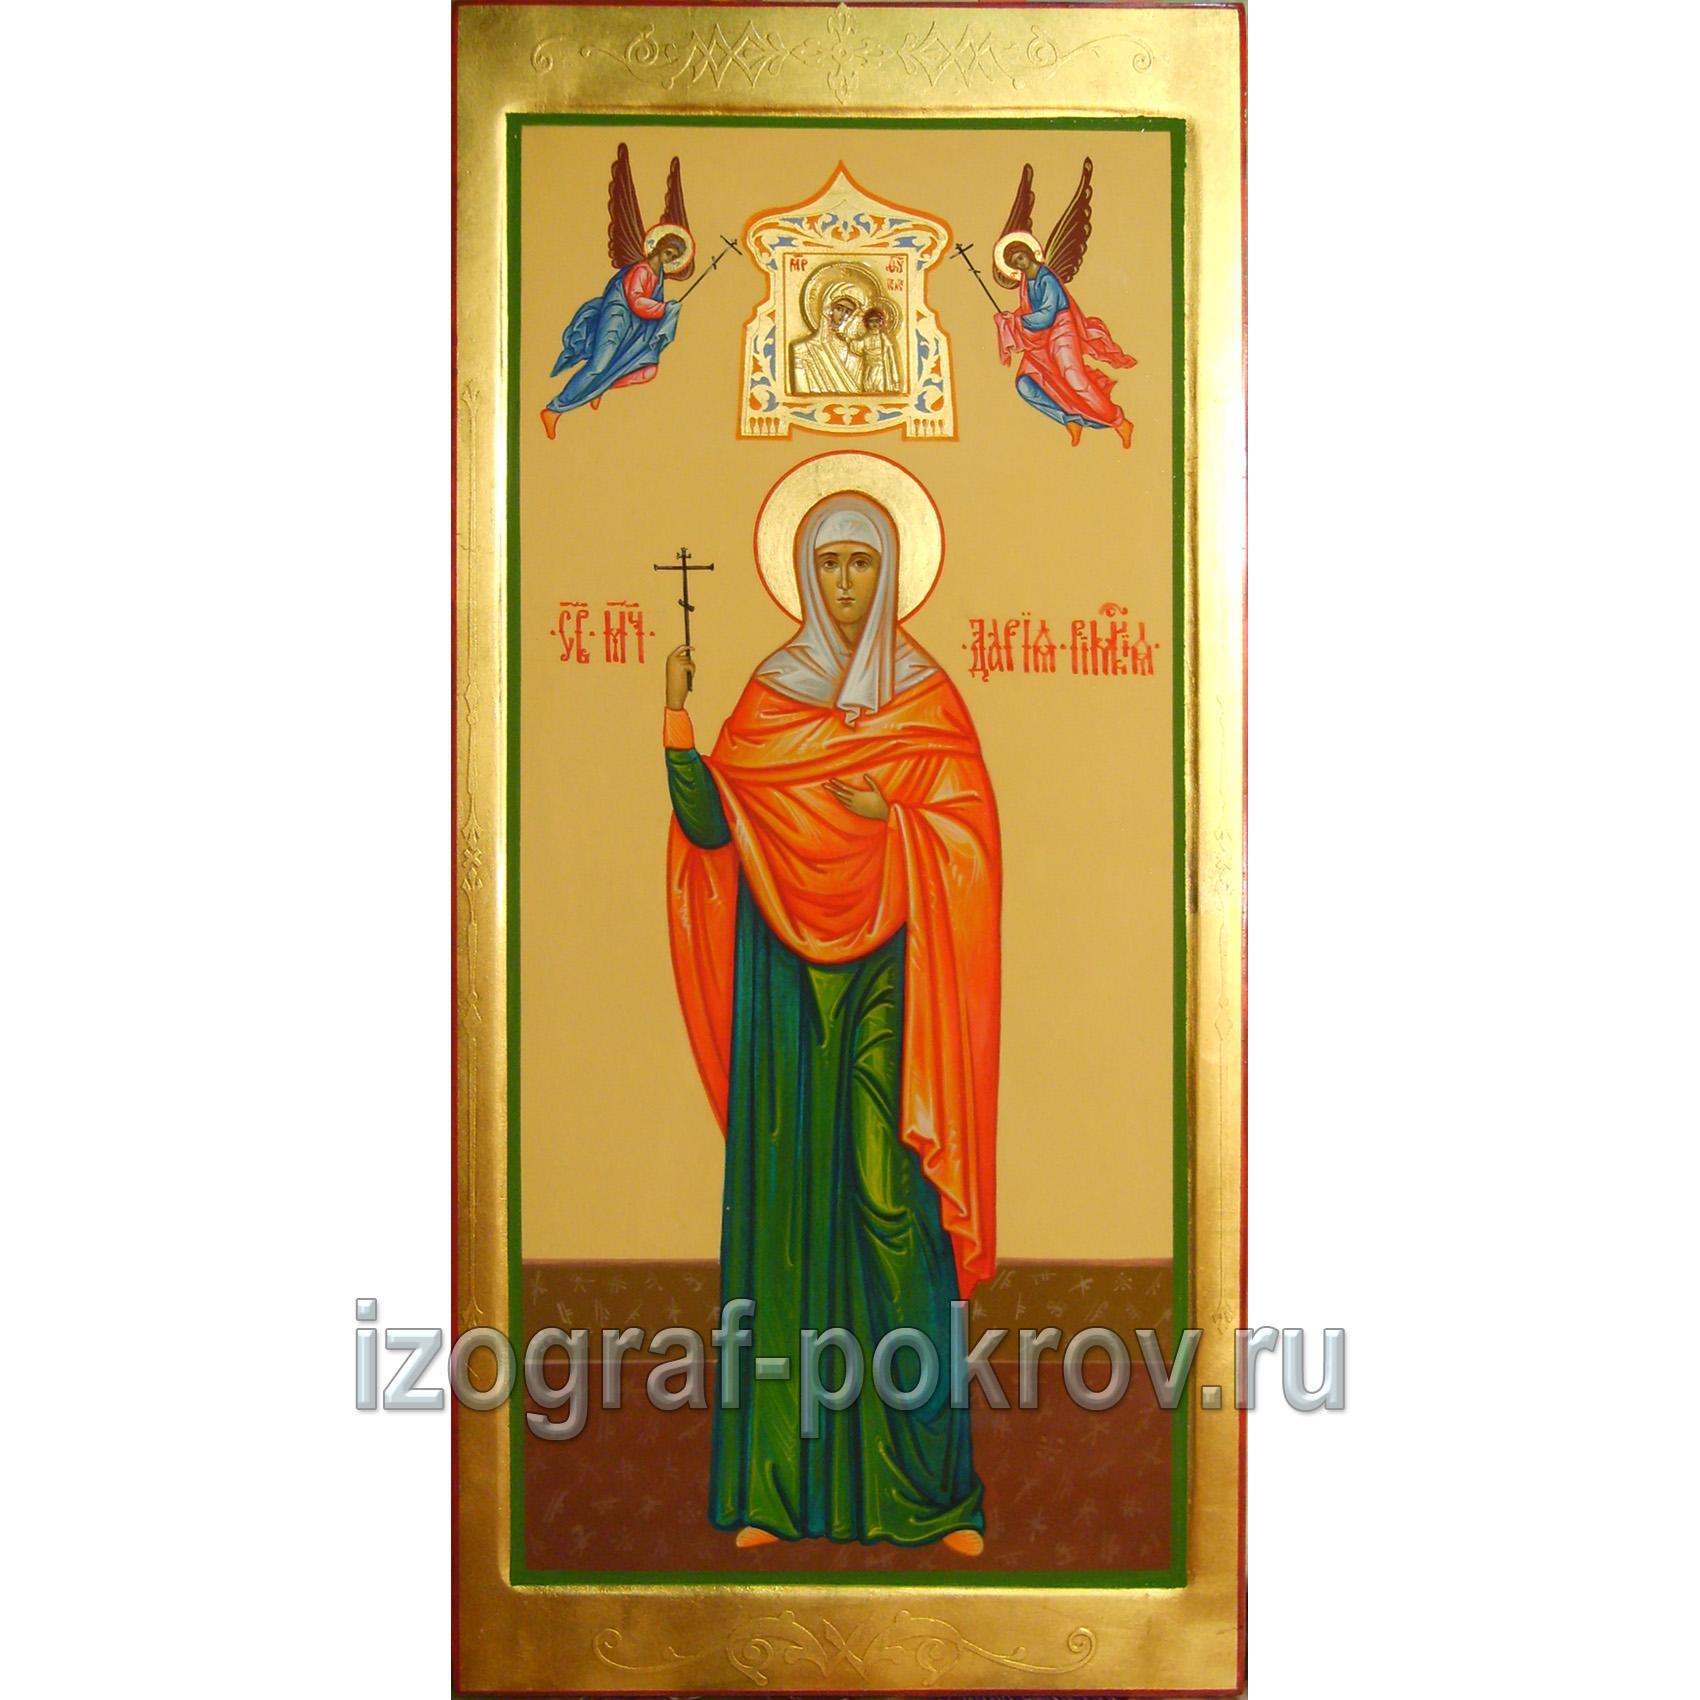 Мерная икона Дарья (Дария) Римская